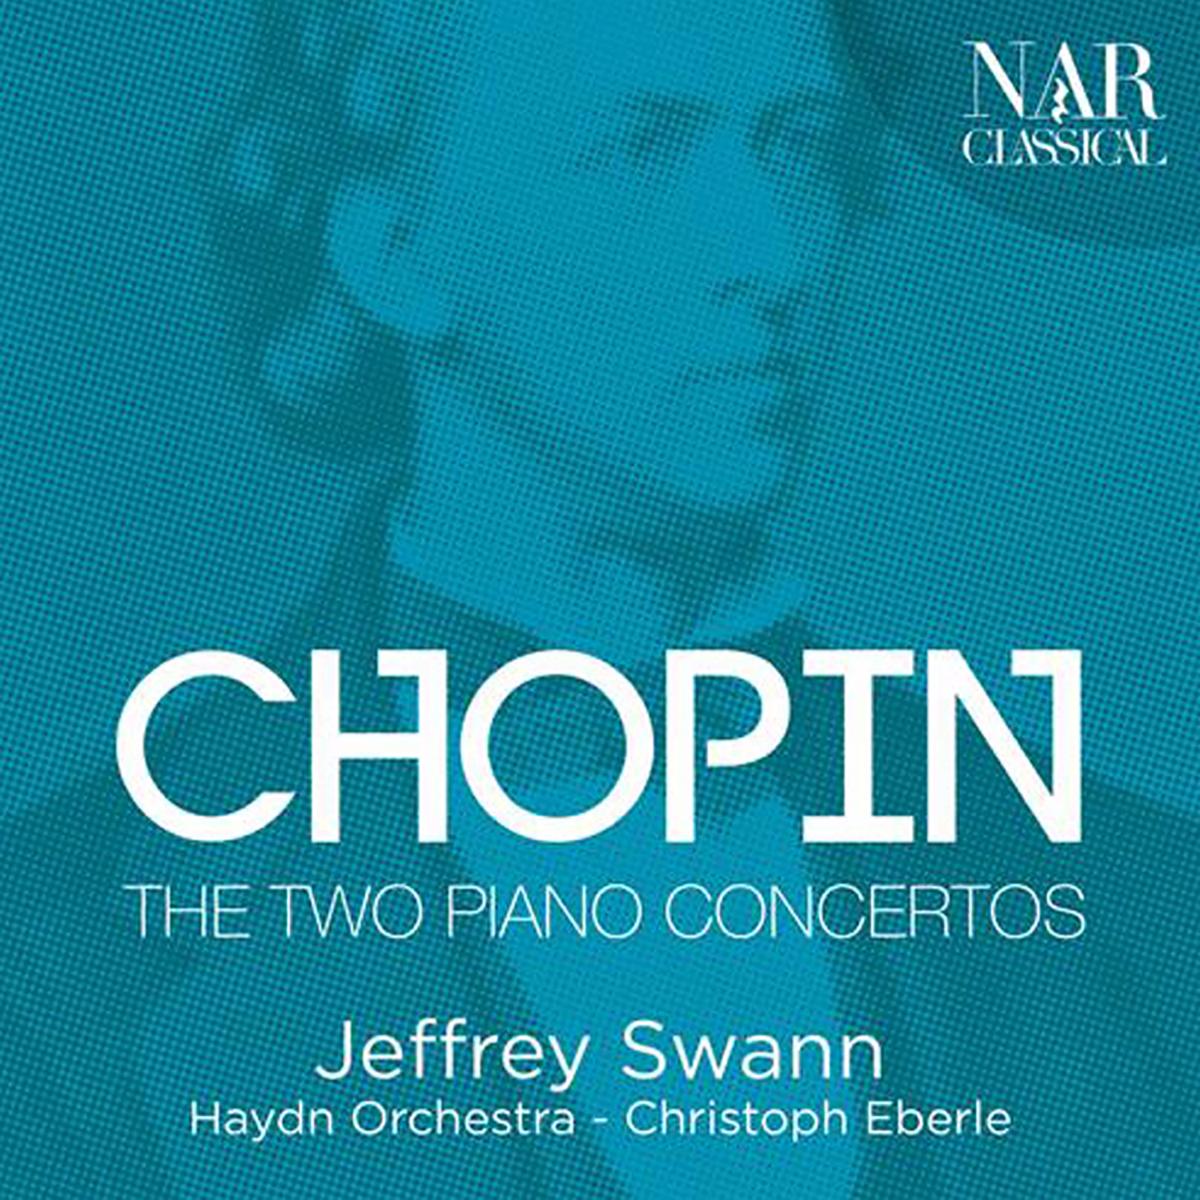 Chopin - Concerti per pianoforte n. 1, 2